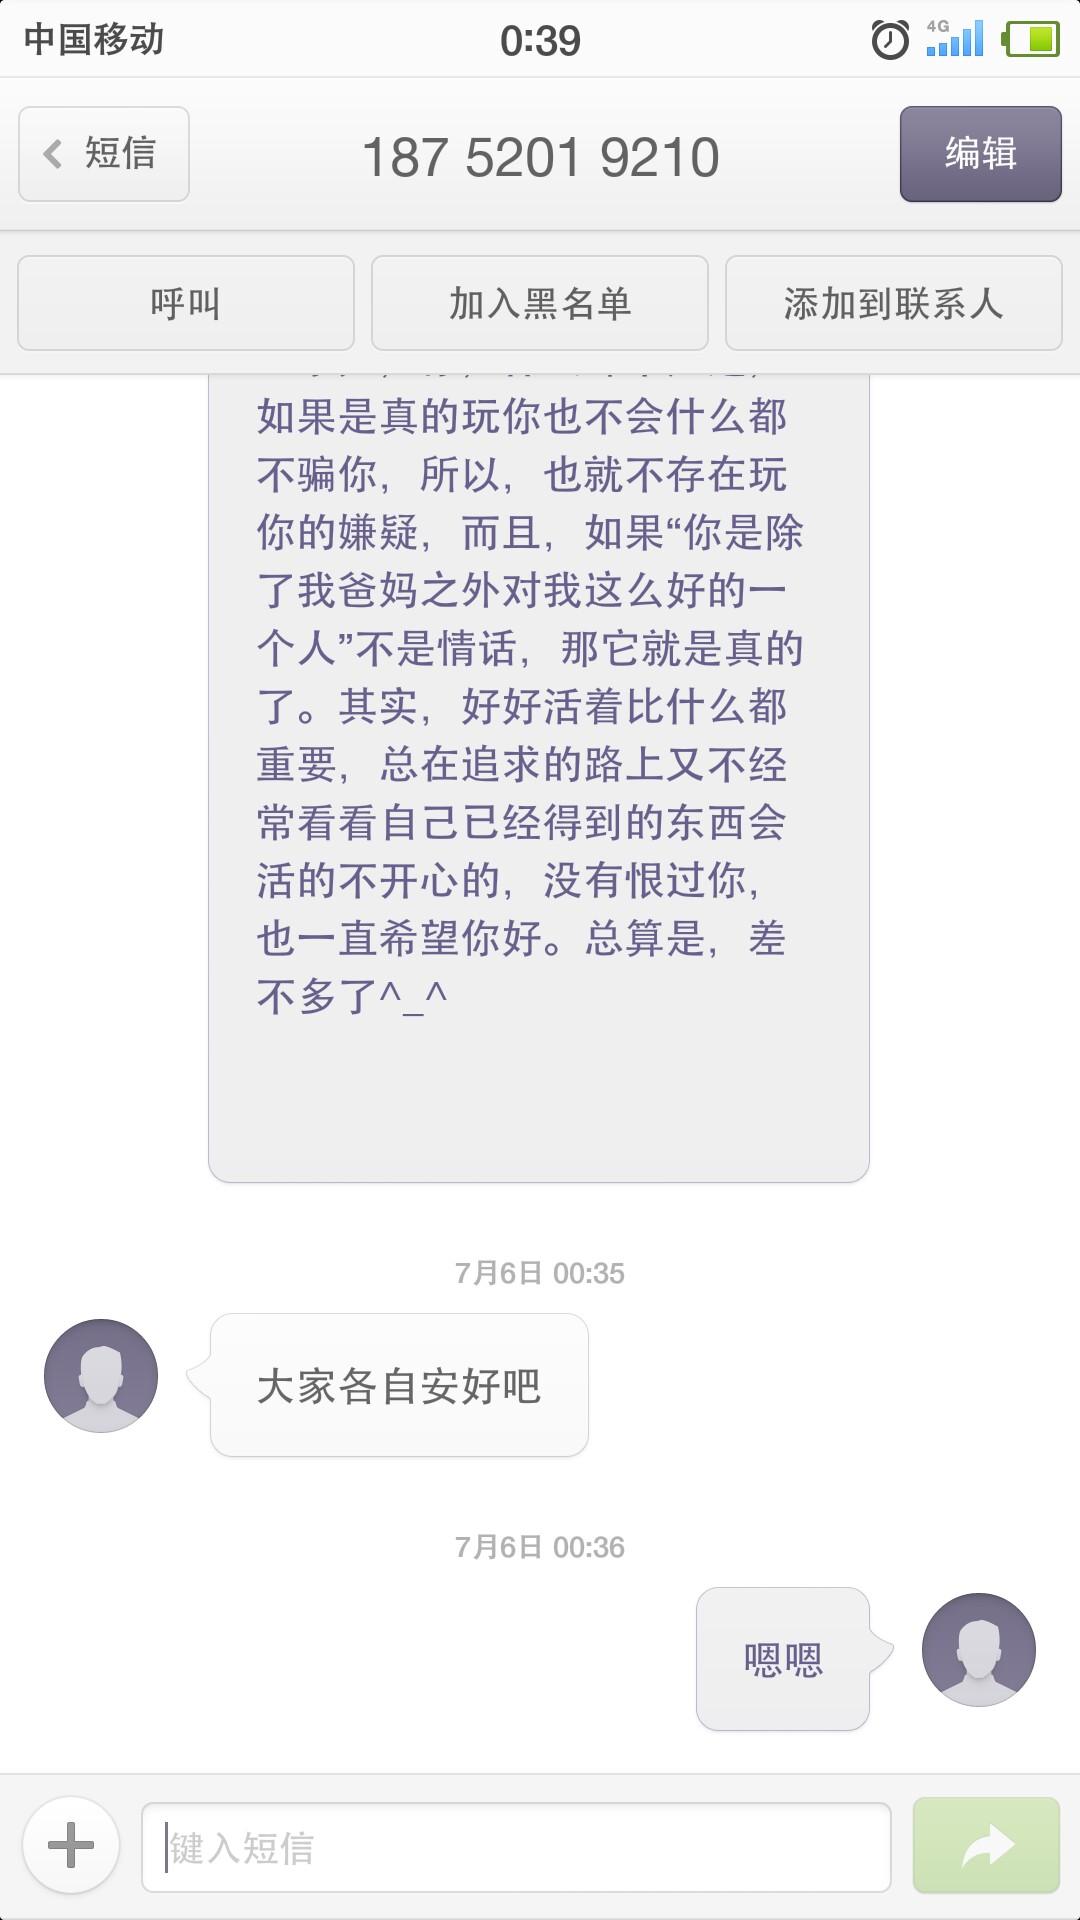 Screenshot_2017-07-06-00-39-12-639_??.png